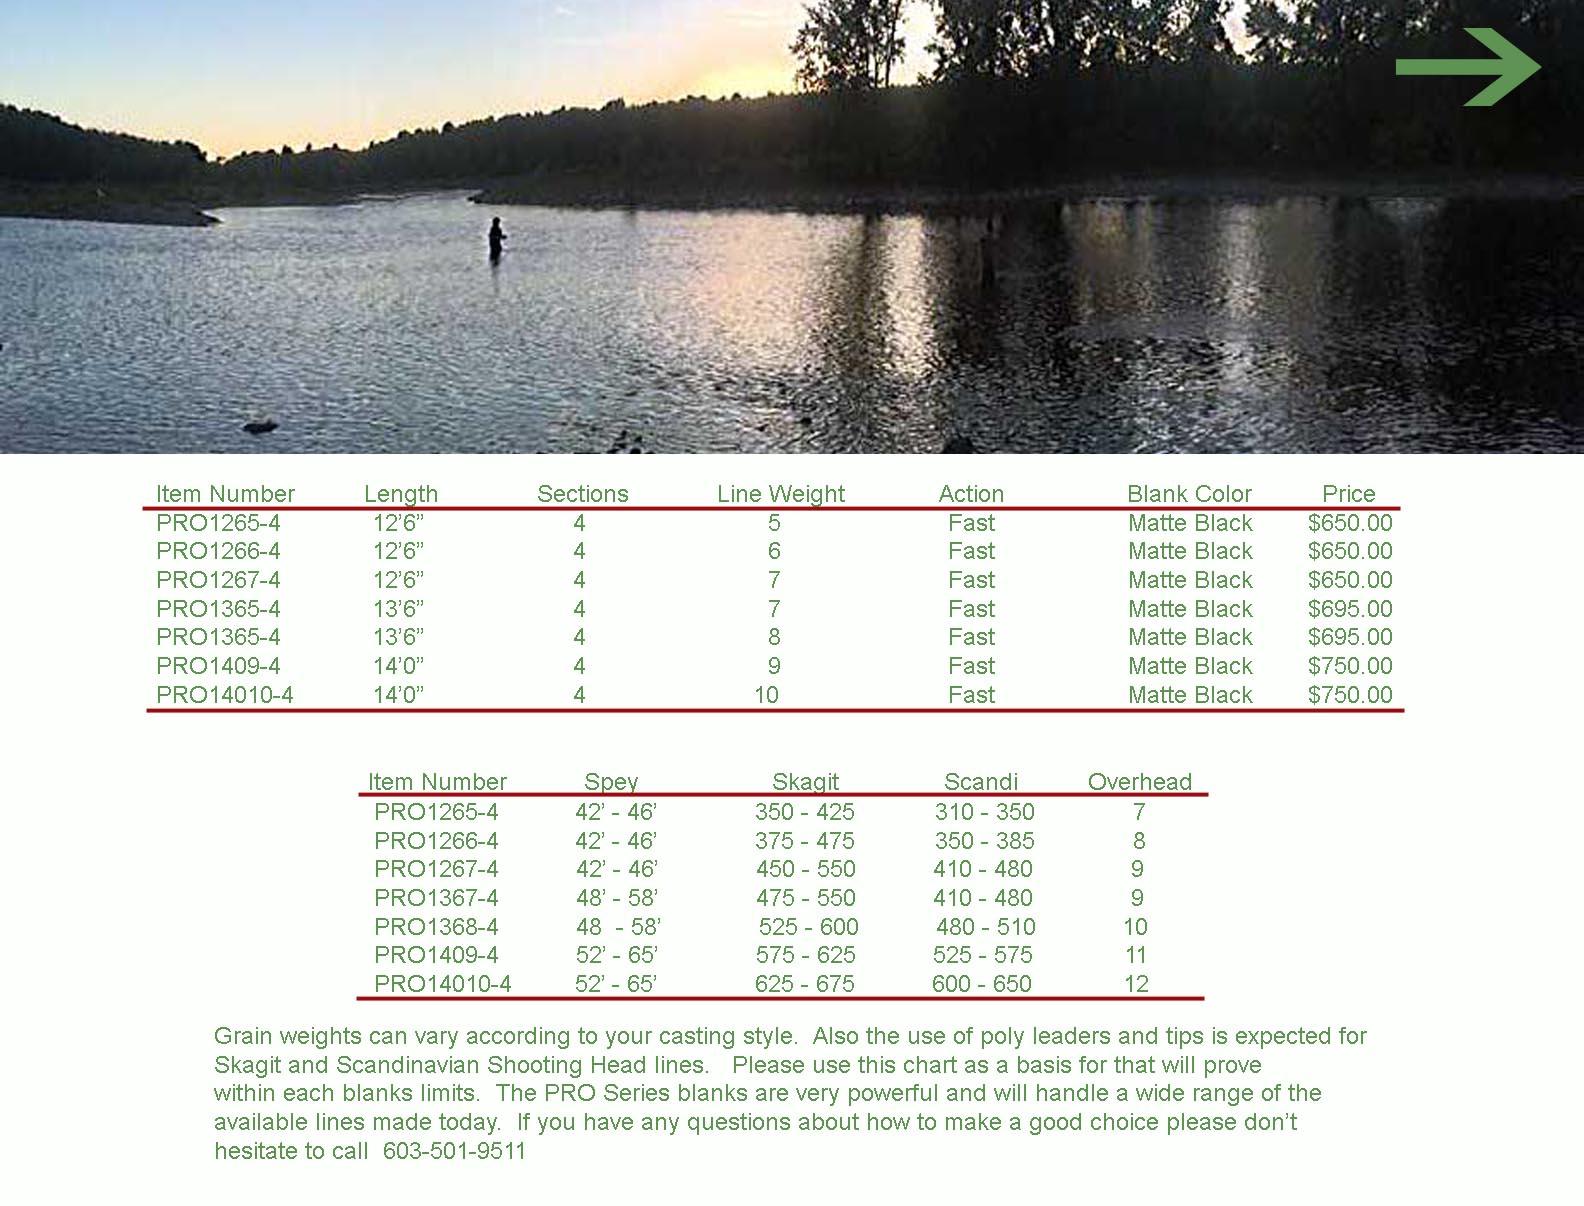 flo-s-pool-page-copy1.jpg